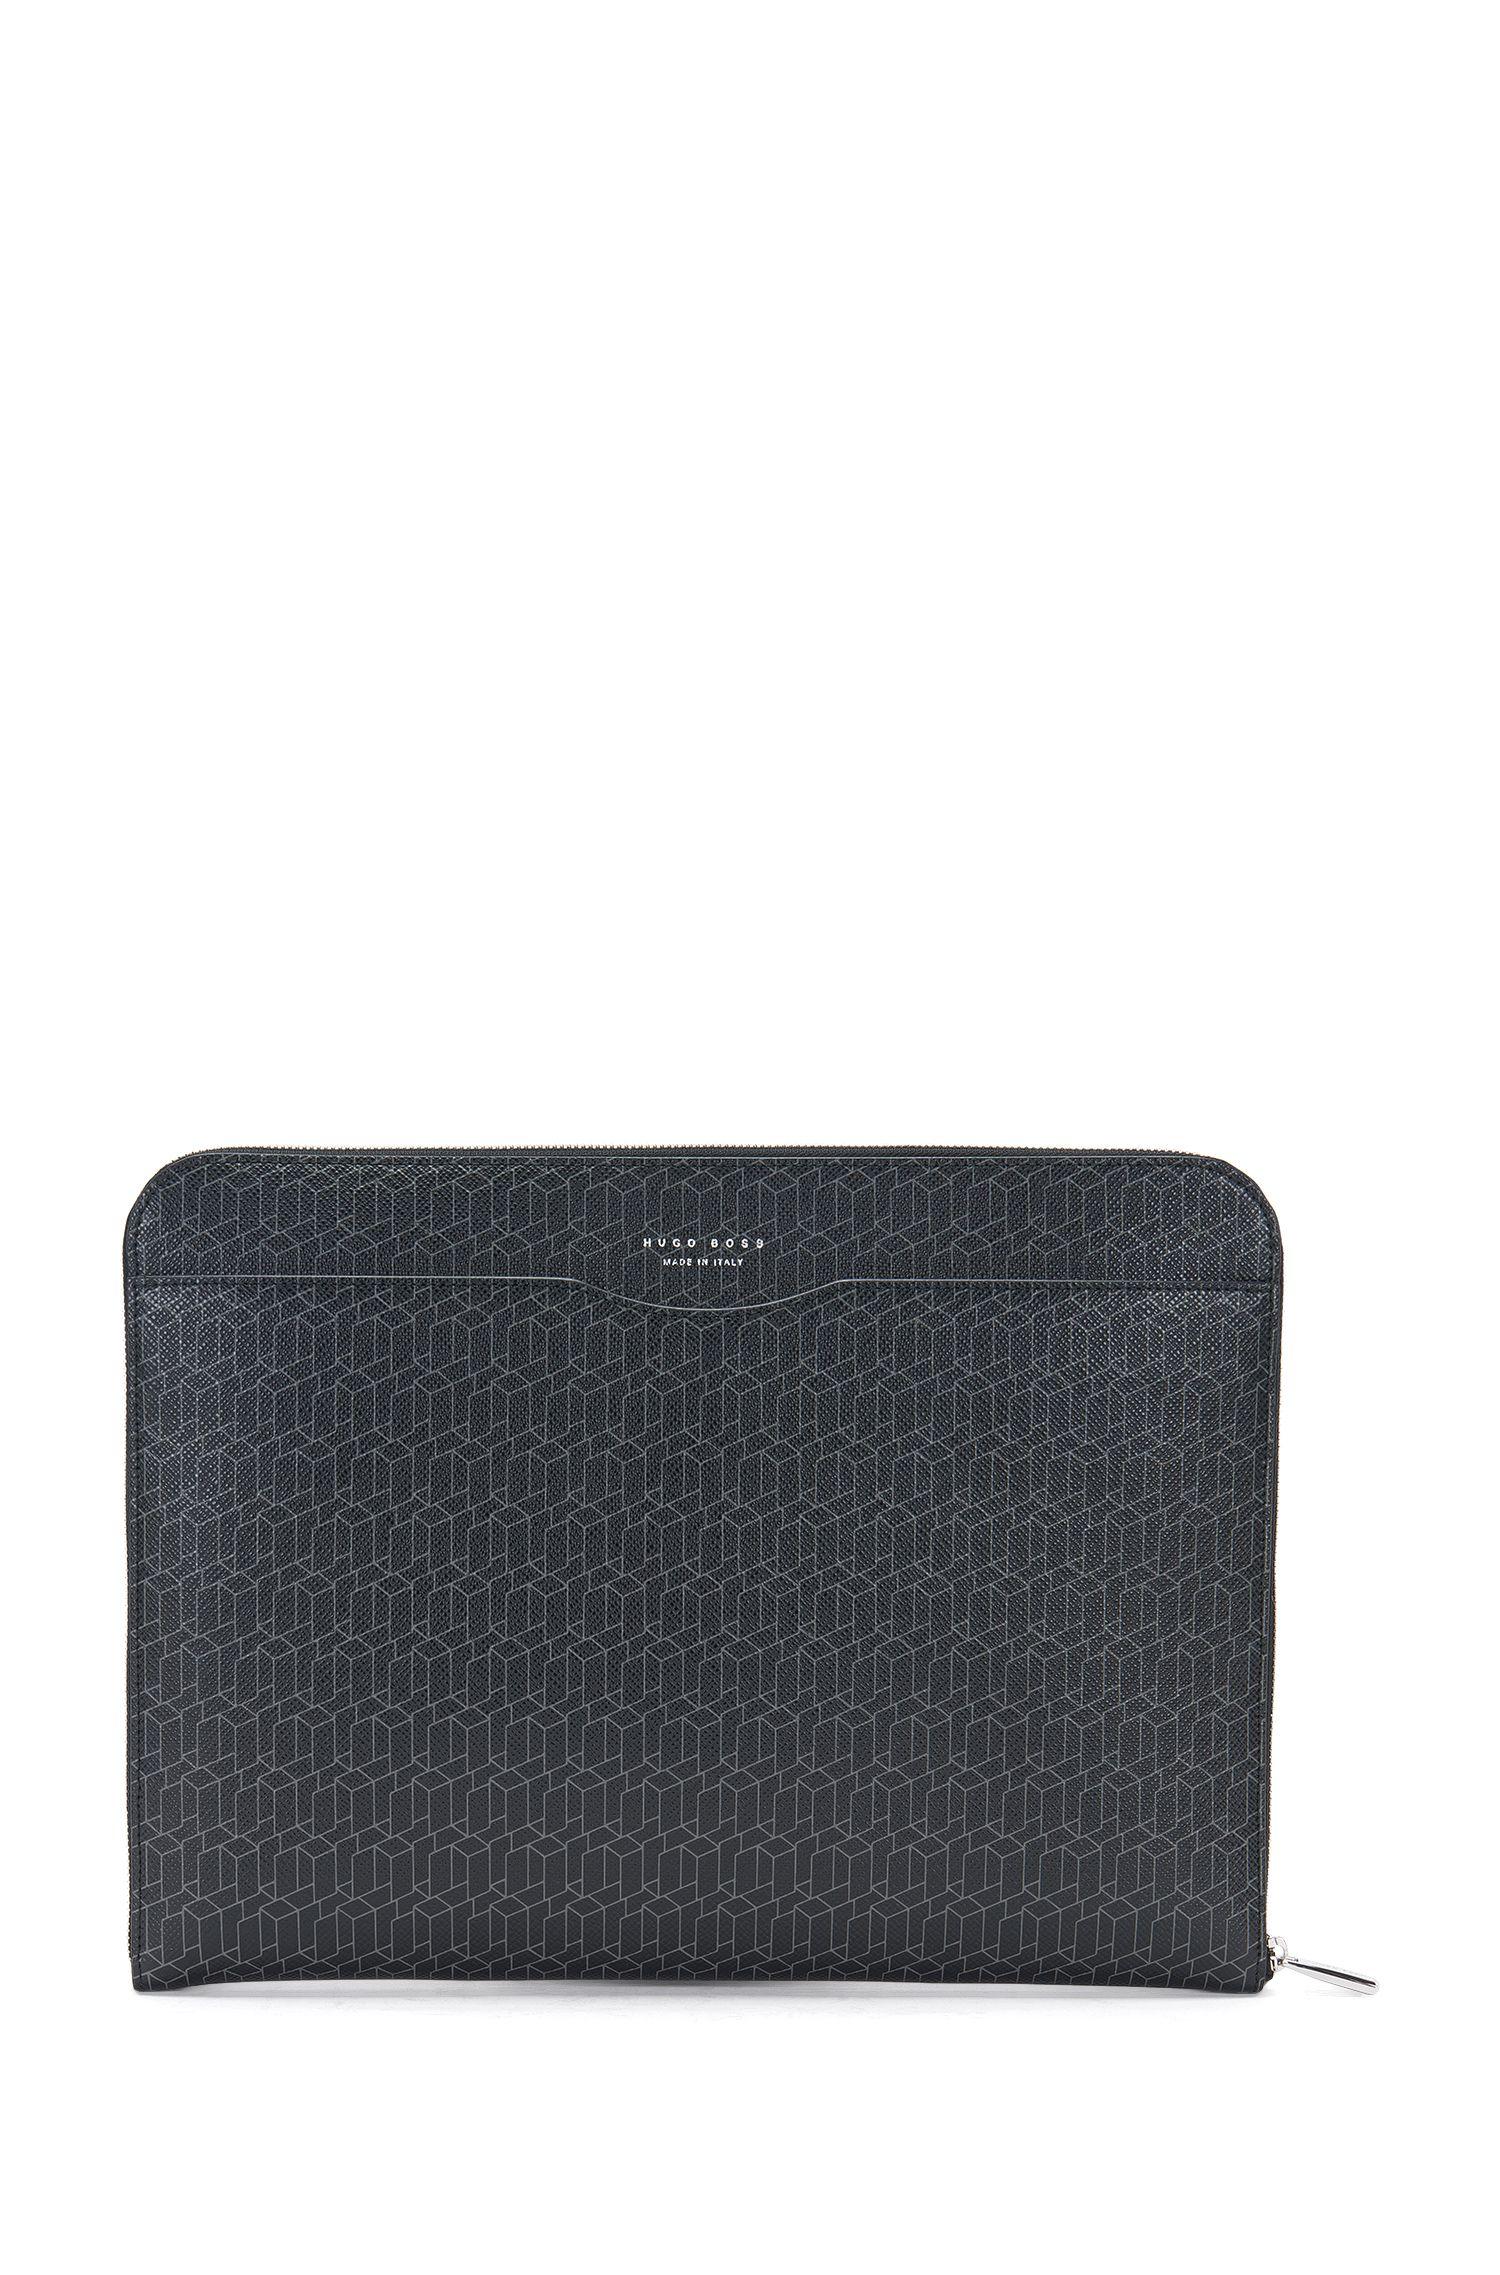 Custodia per laptop in pelle con stampa geometrica: 'Signature H_portf'